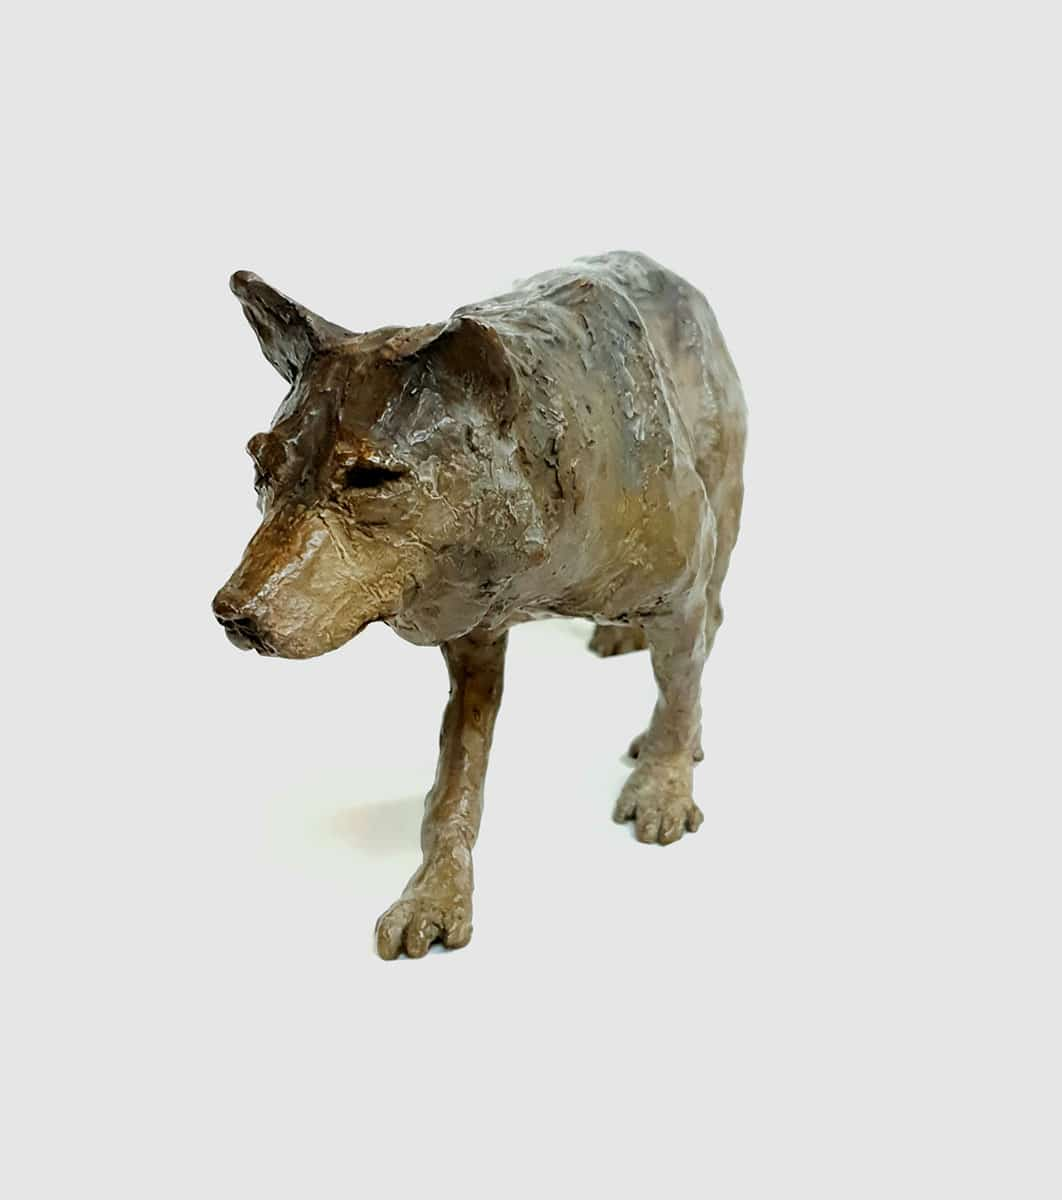 Loup – Sculpture bronze-Marie-Joëlle Cédat-artiste animalier peinture animaliere-art-animalier- peintre-animalier 5 x 7x 9 cm – marie-Joëlle Cédat artiste animalier